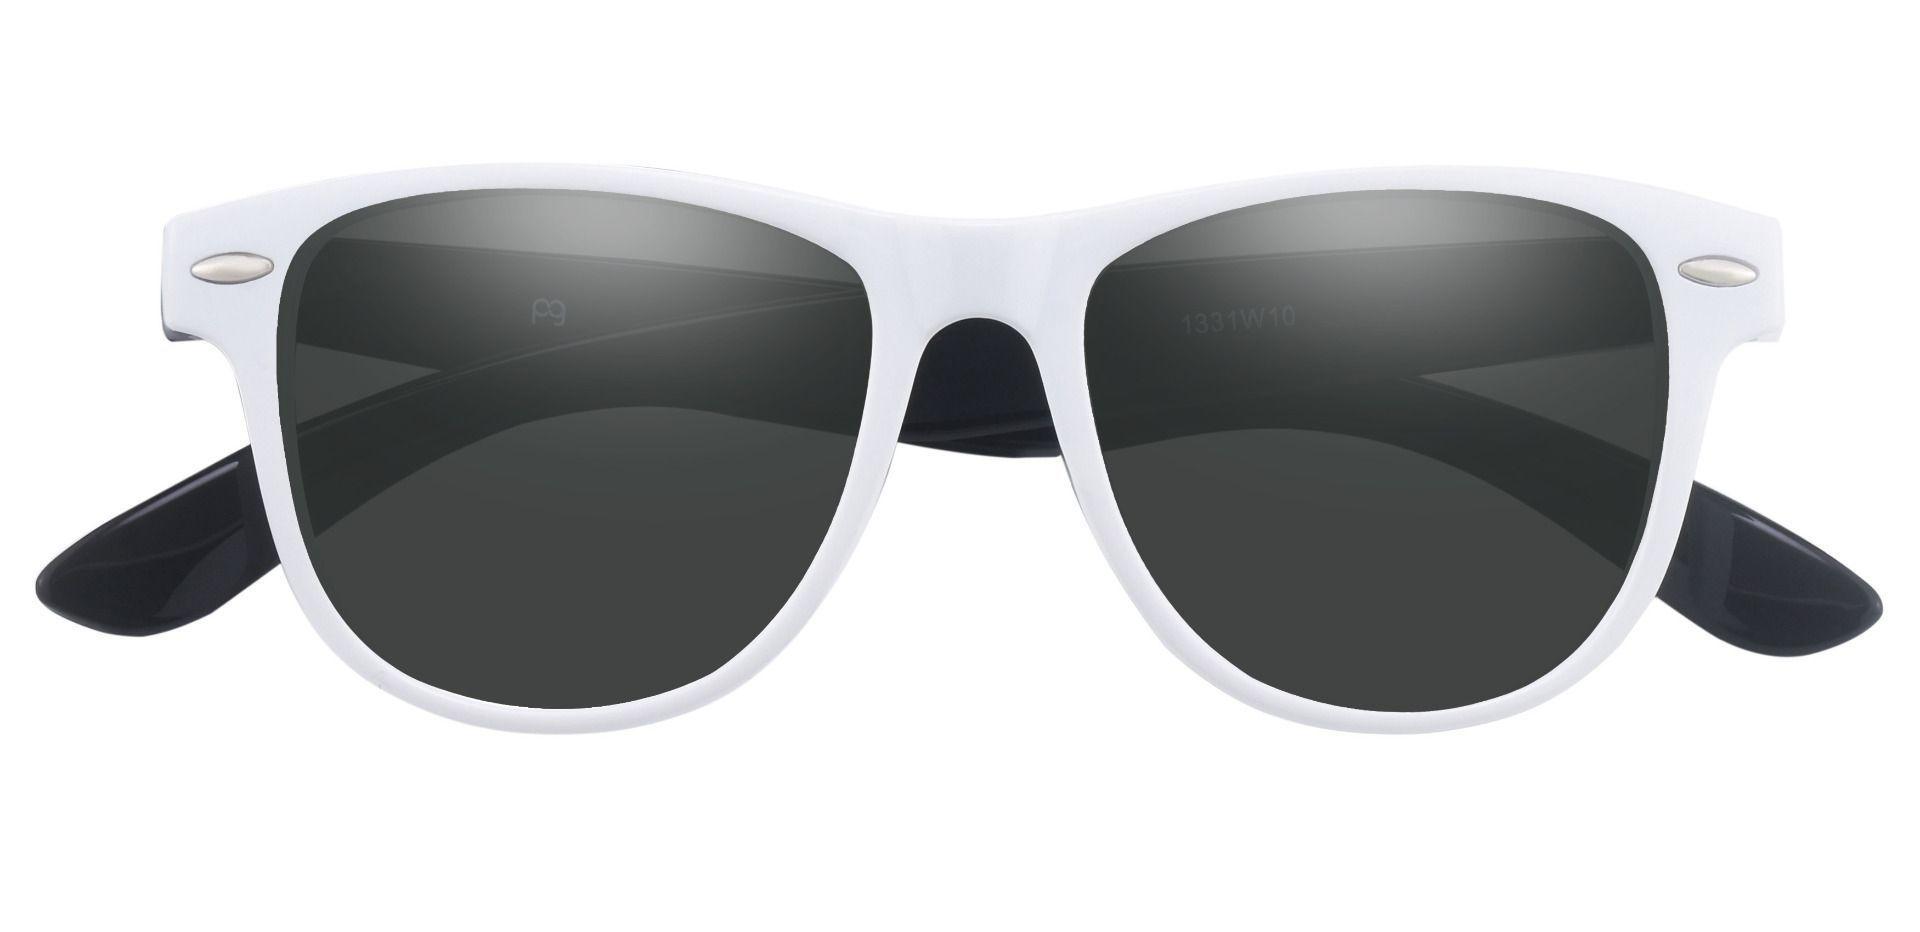 Radio Square Prescription Sunglasses - White Frame With Gray Lenses